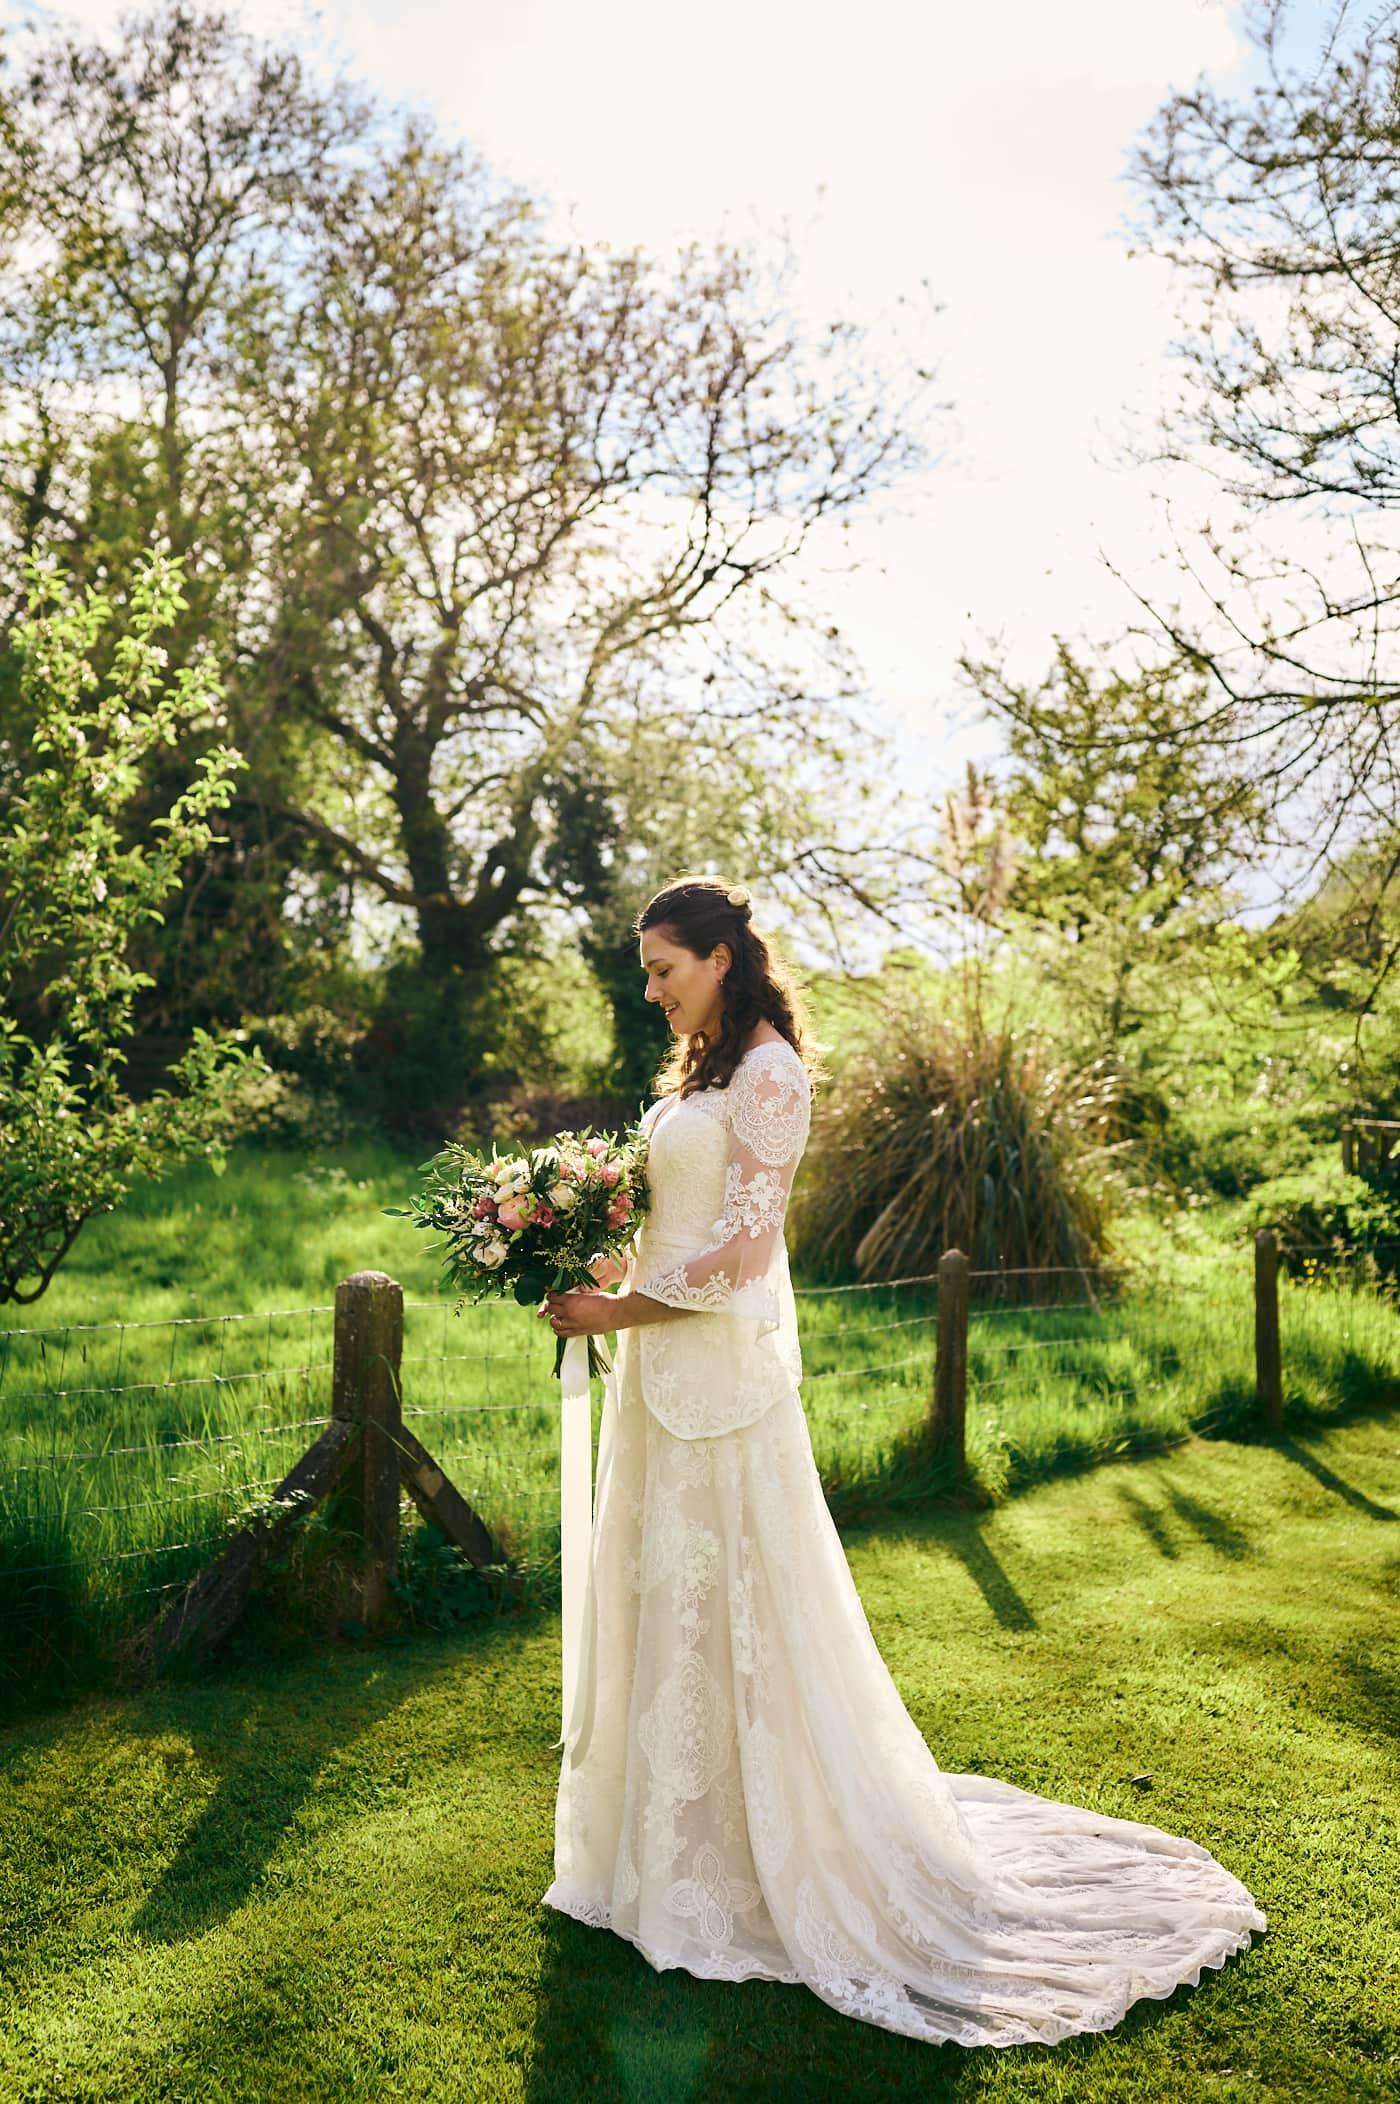 Bride in beautiful wedding dress holding bouquet stands in garden